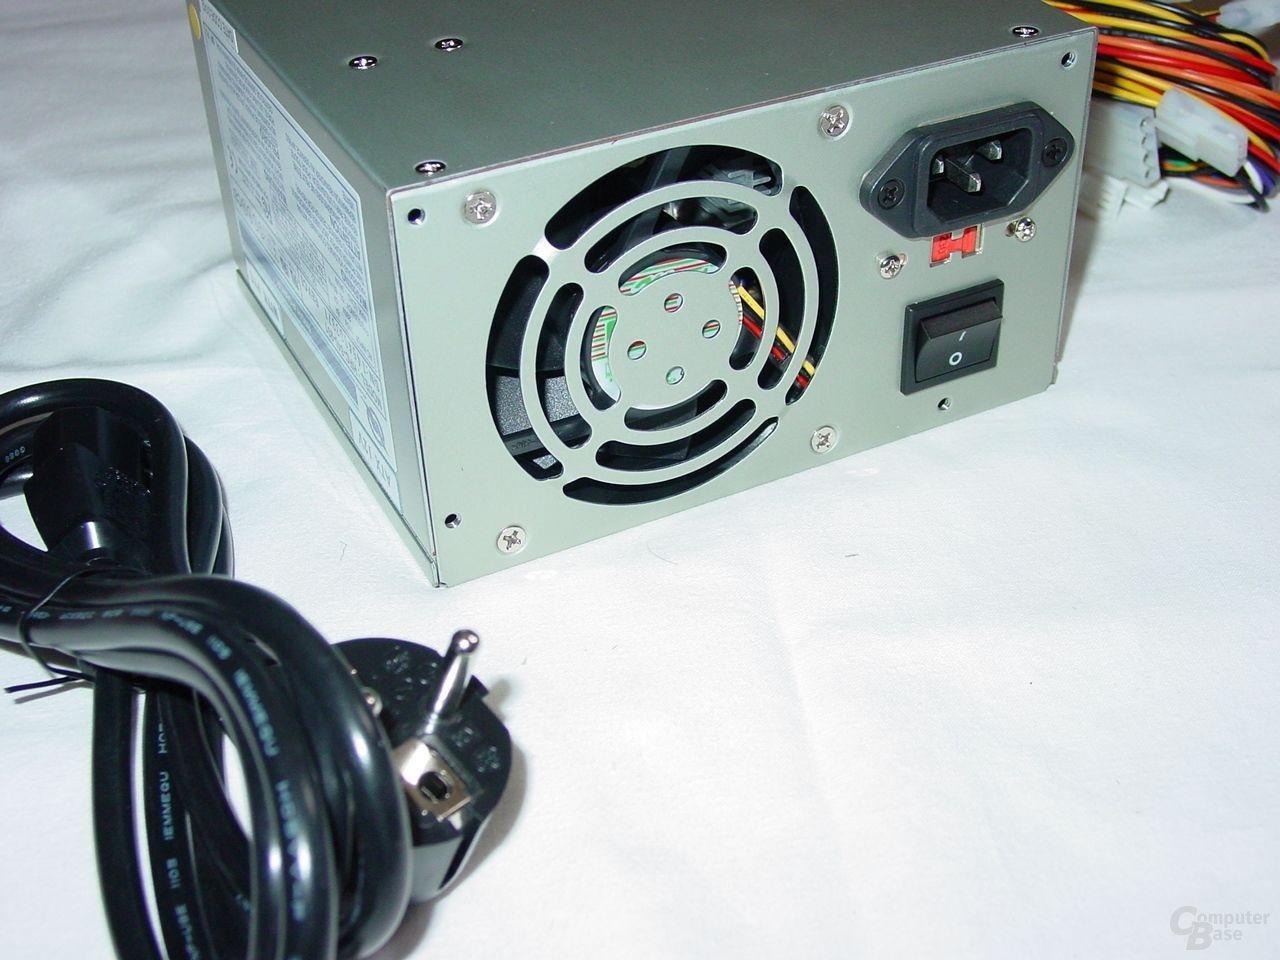 Sirtec HPC 340-201